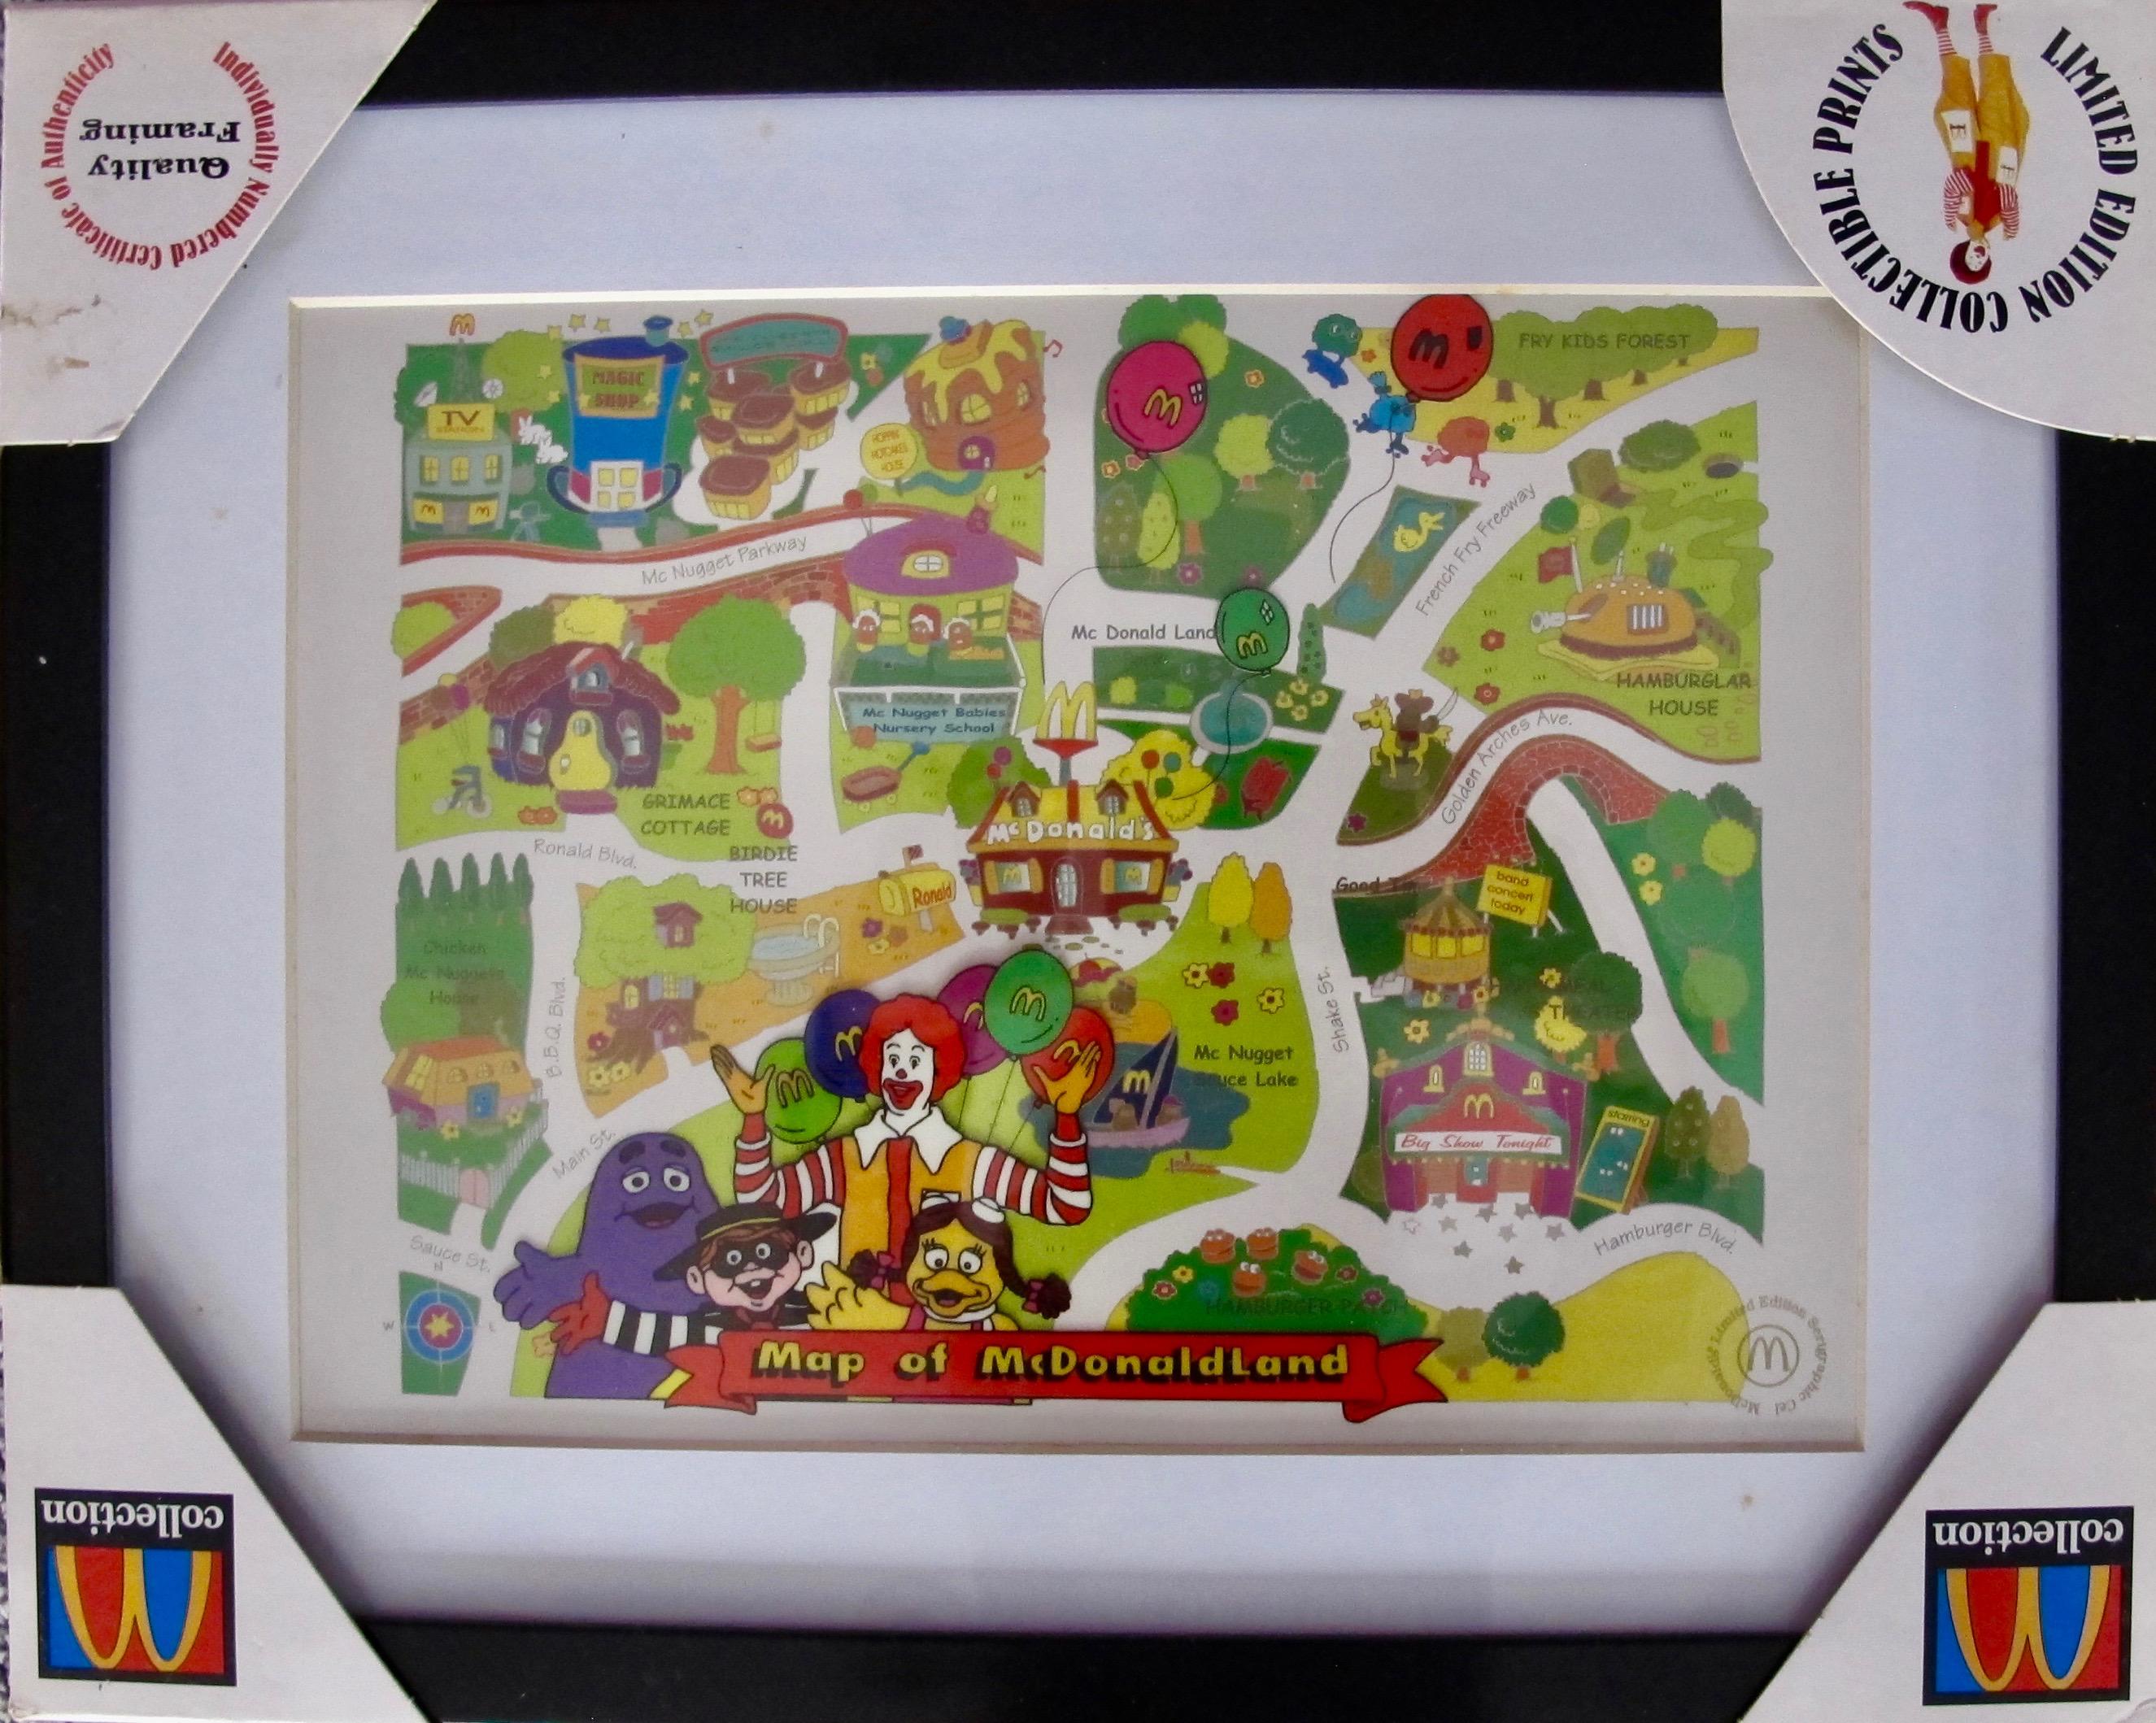 McDonald's 1998 Framed McDonaldland Map Sericel Animation Cel RARE COLLECTIBLE!